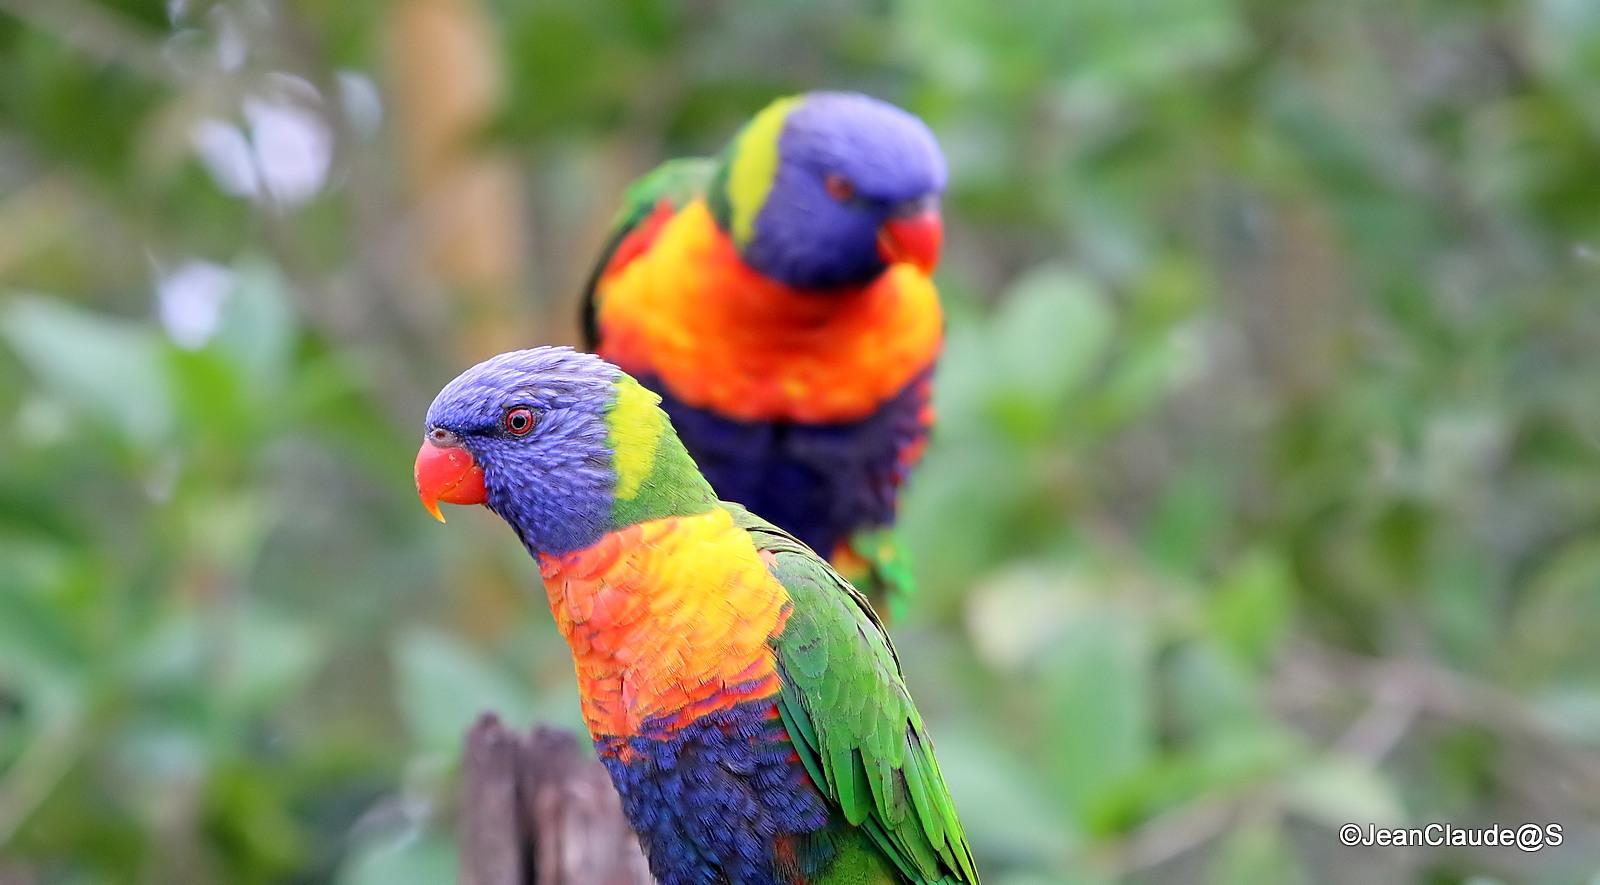 Zoo la Flèche Img_4045_filtered-5300eea